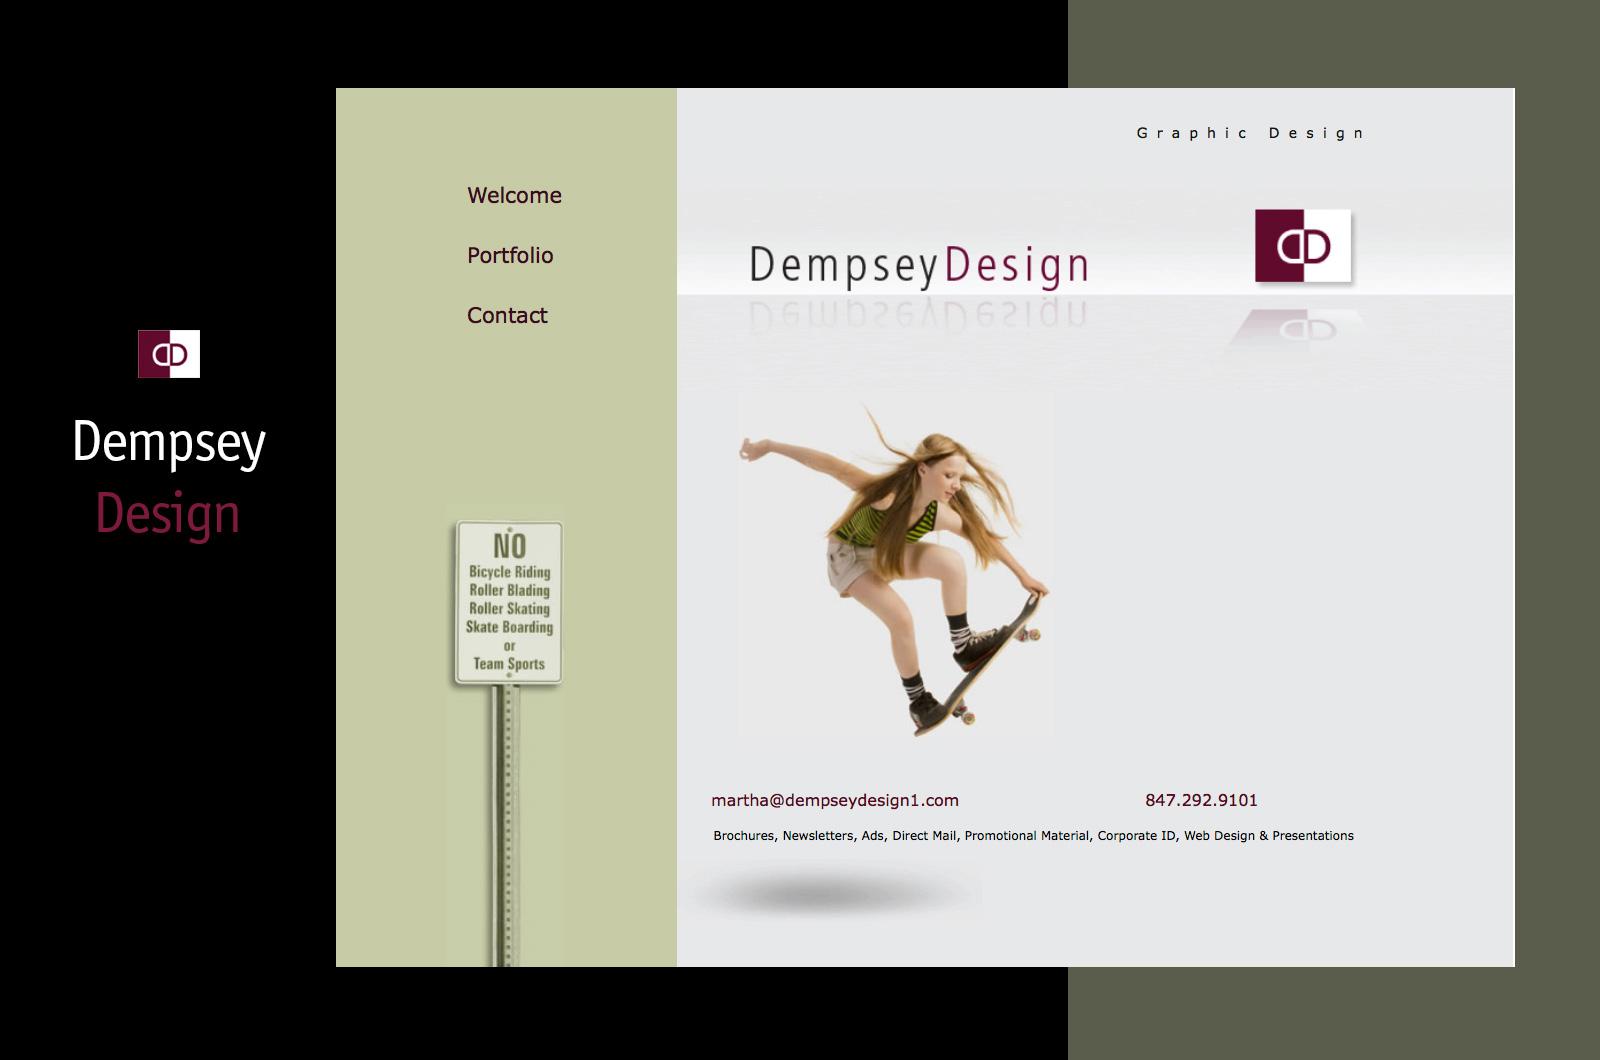 dempsy-web-1600